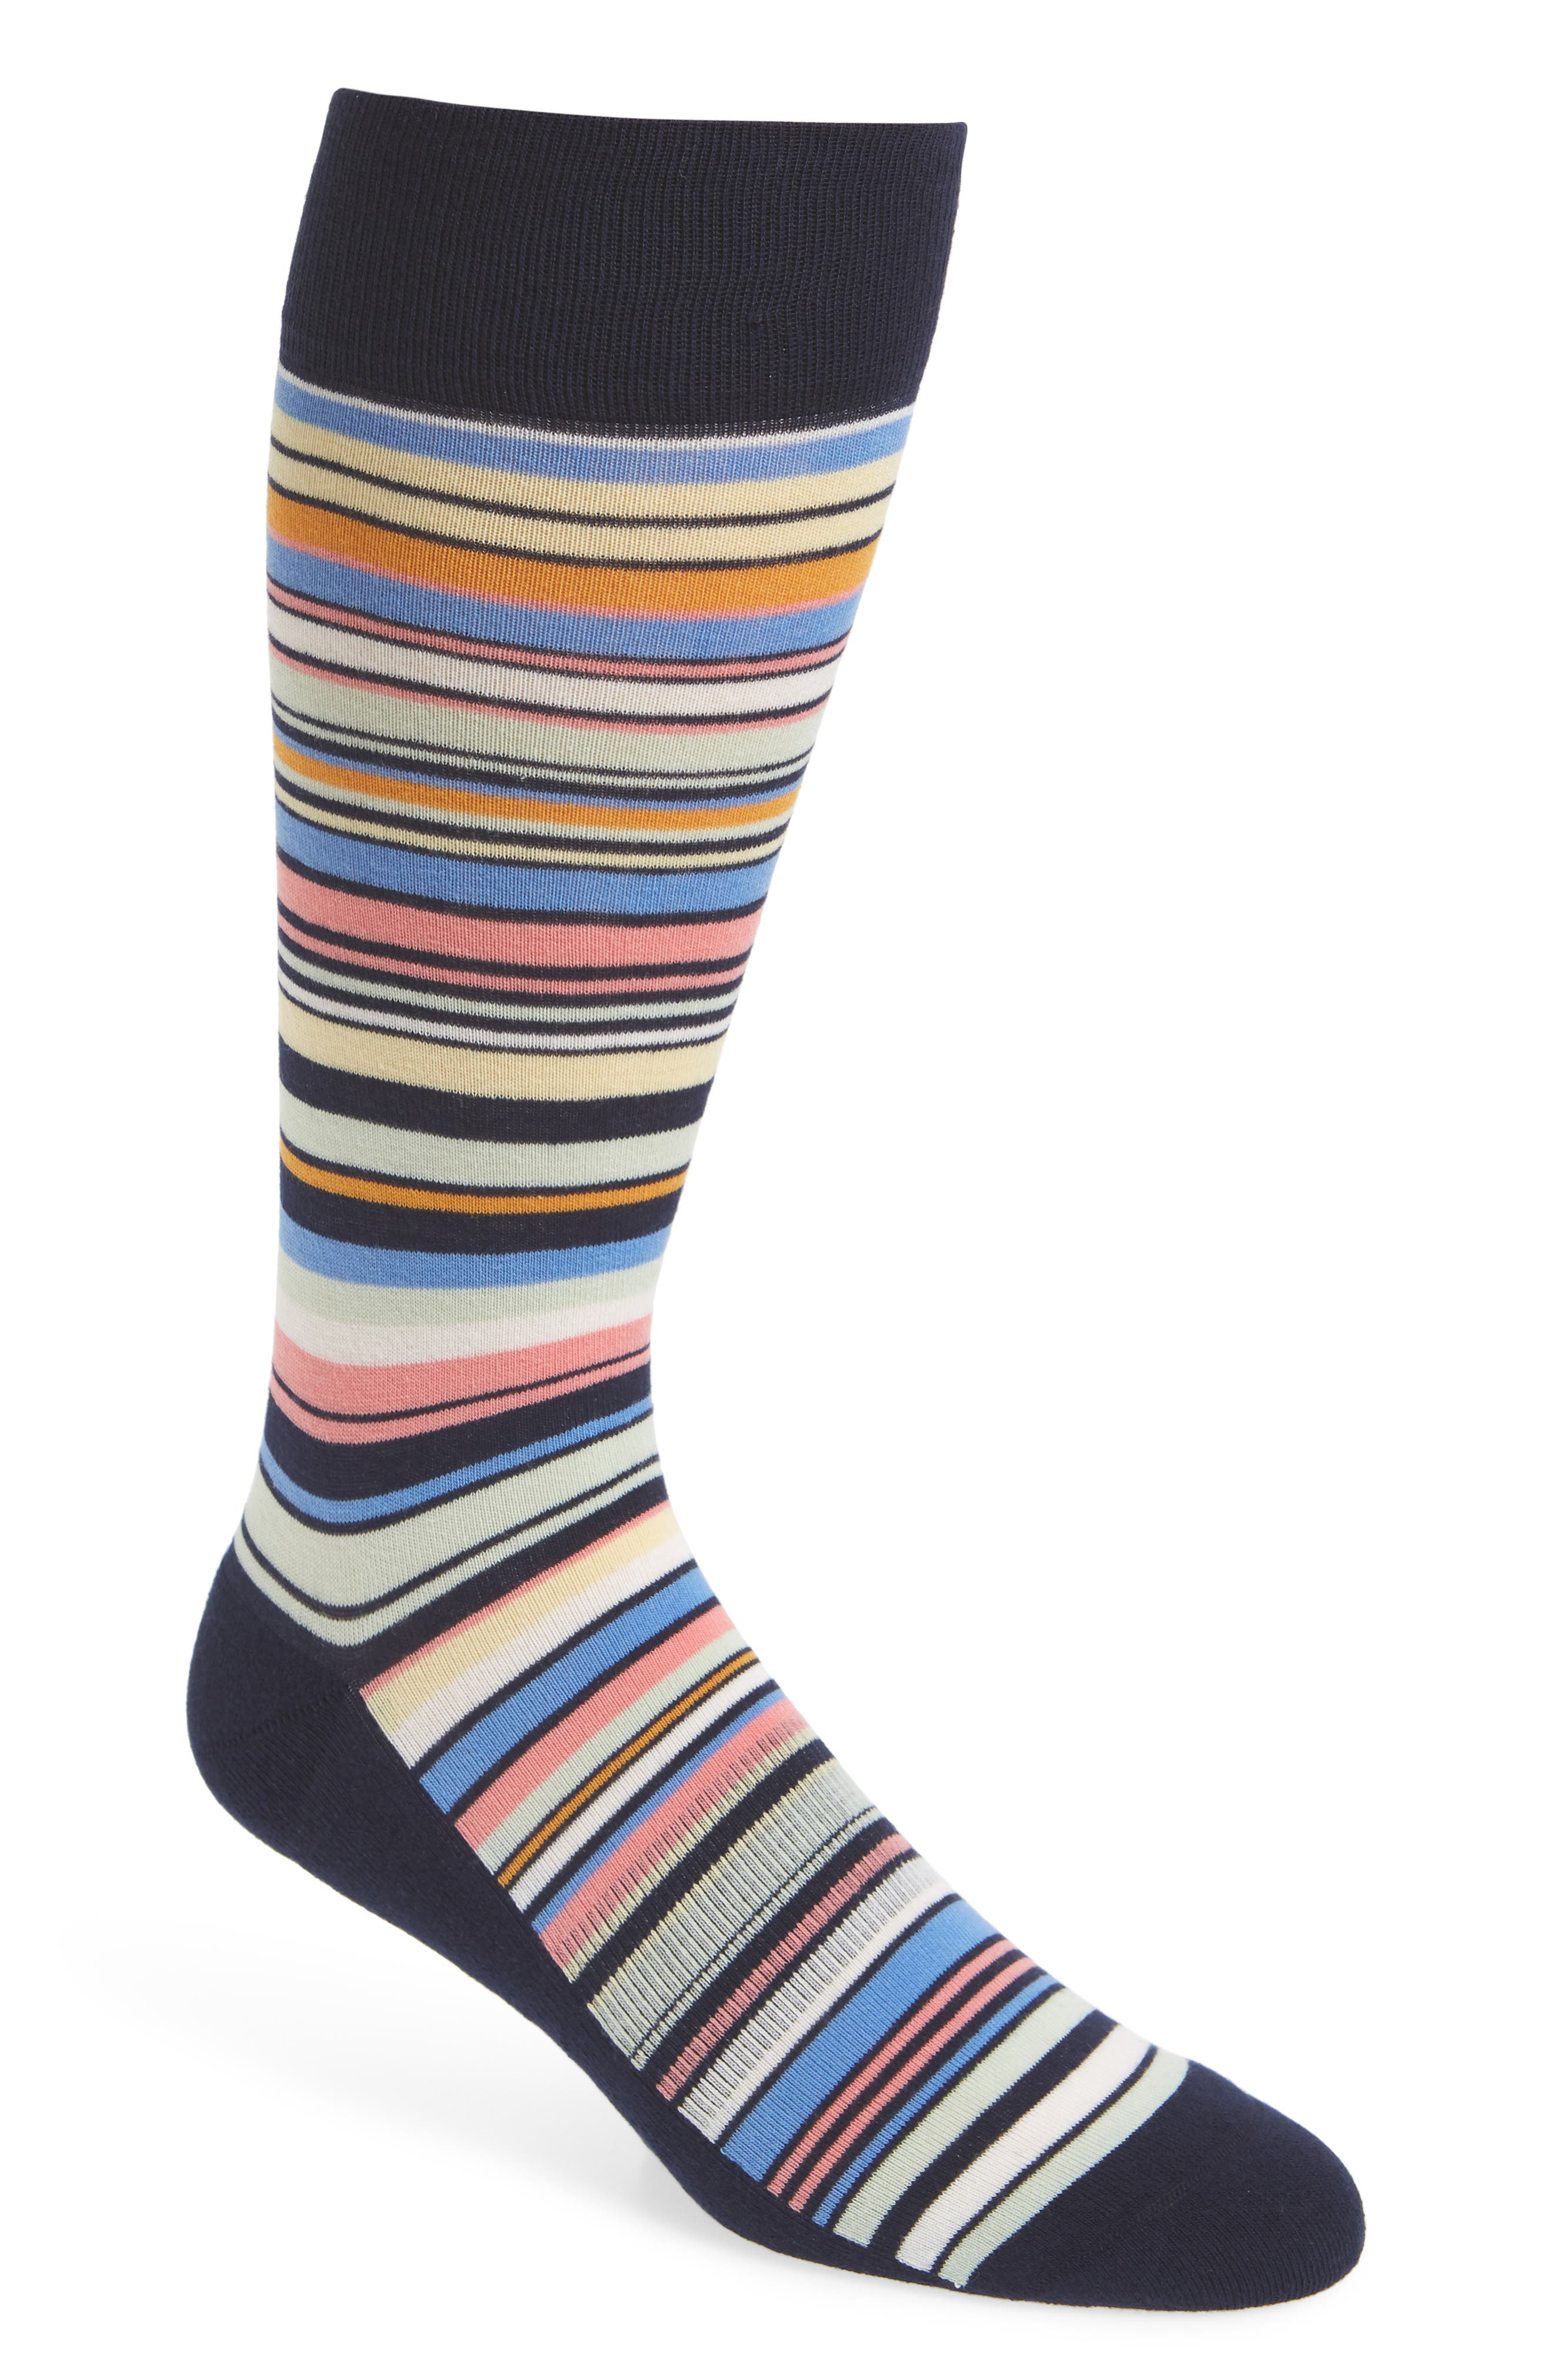 Stripe Socks,                             Main thumbnail 1, color,                             NAVY/ PALE YELLOW